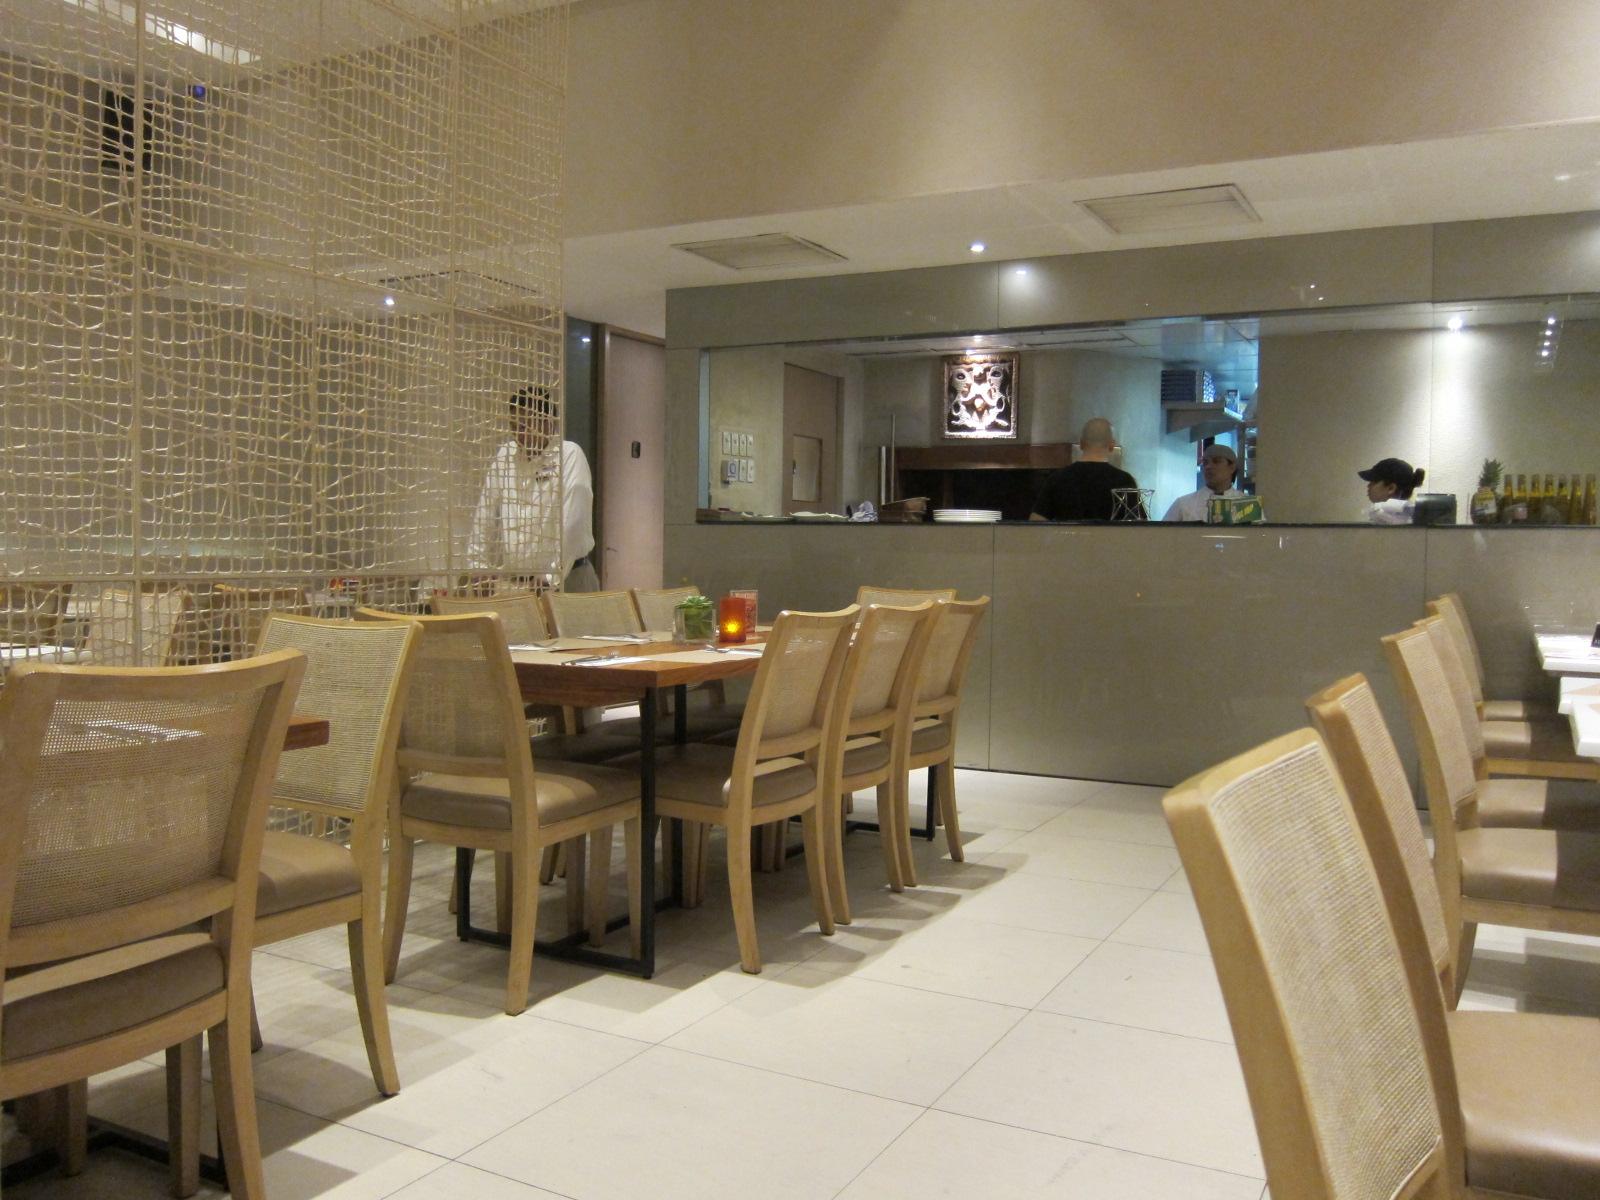 Jessica Choy: Aria Cucina Italiana